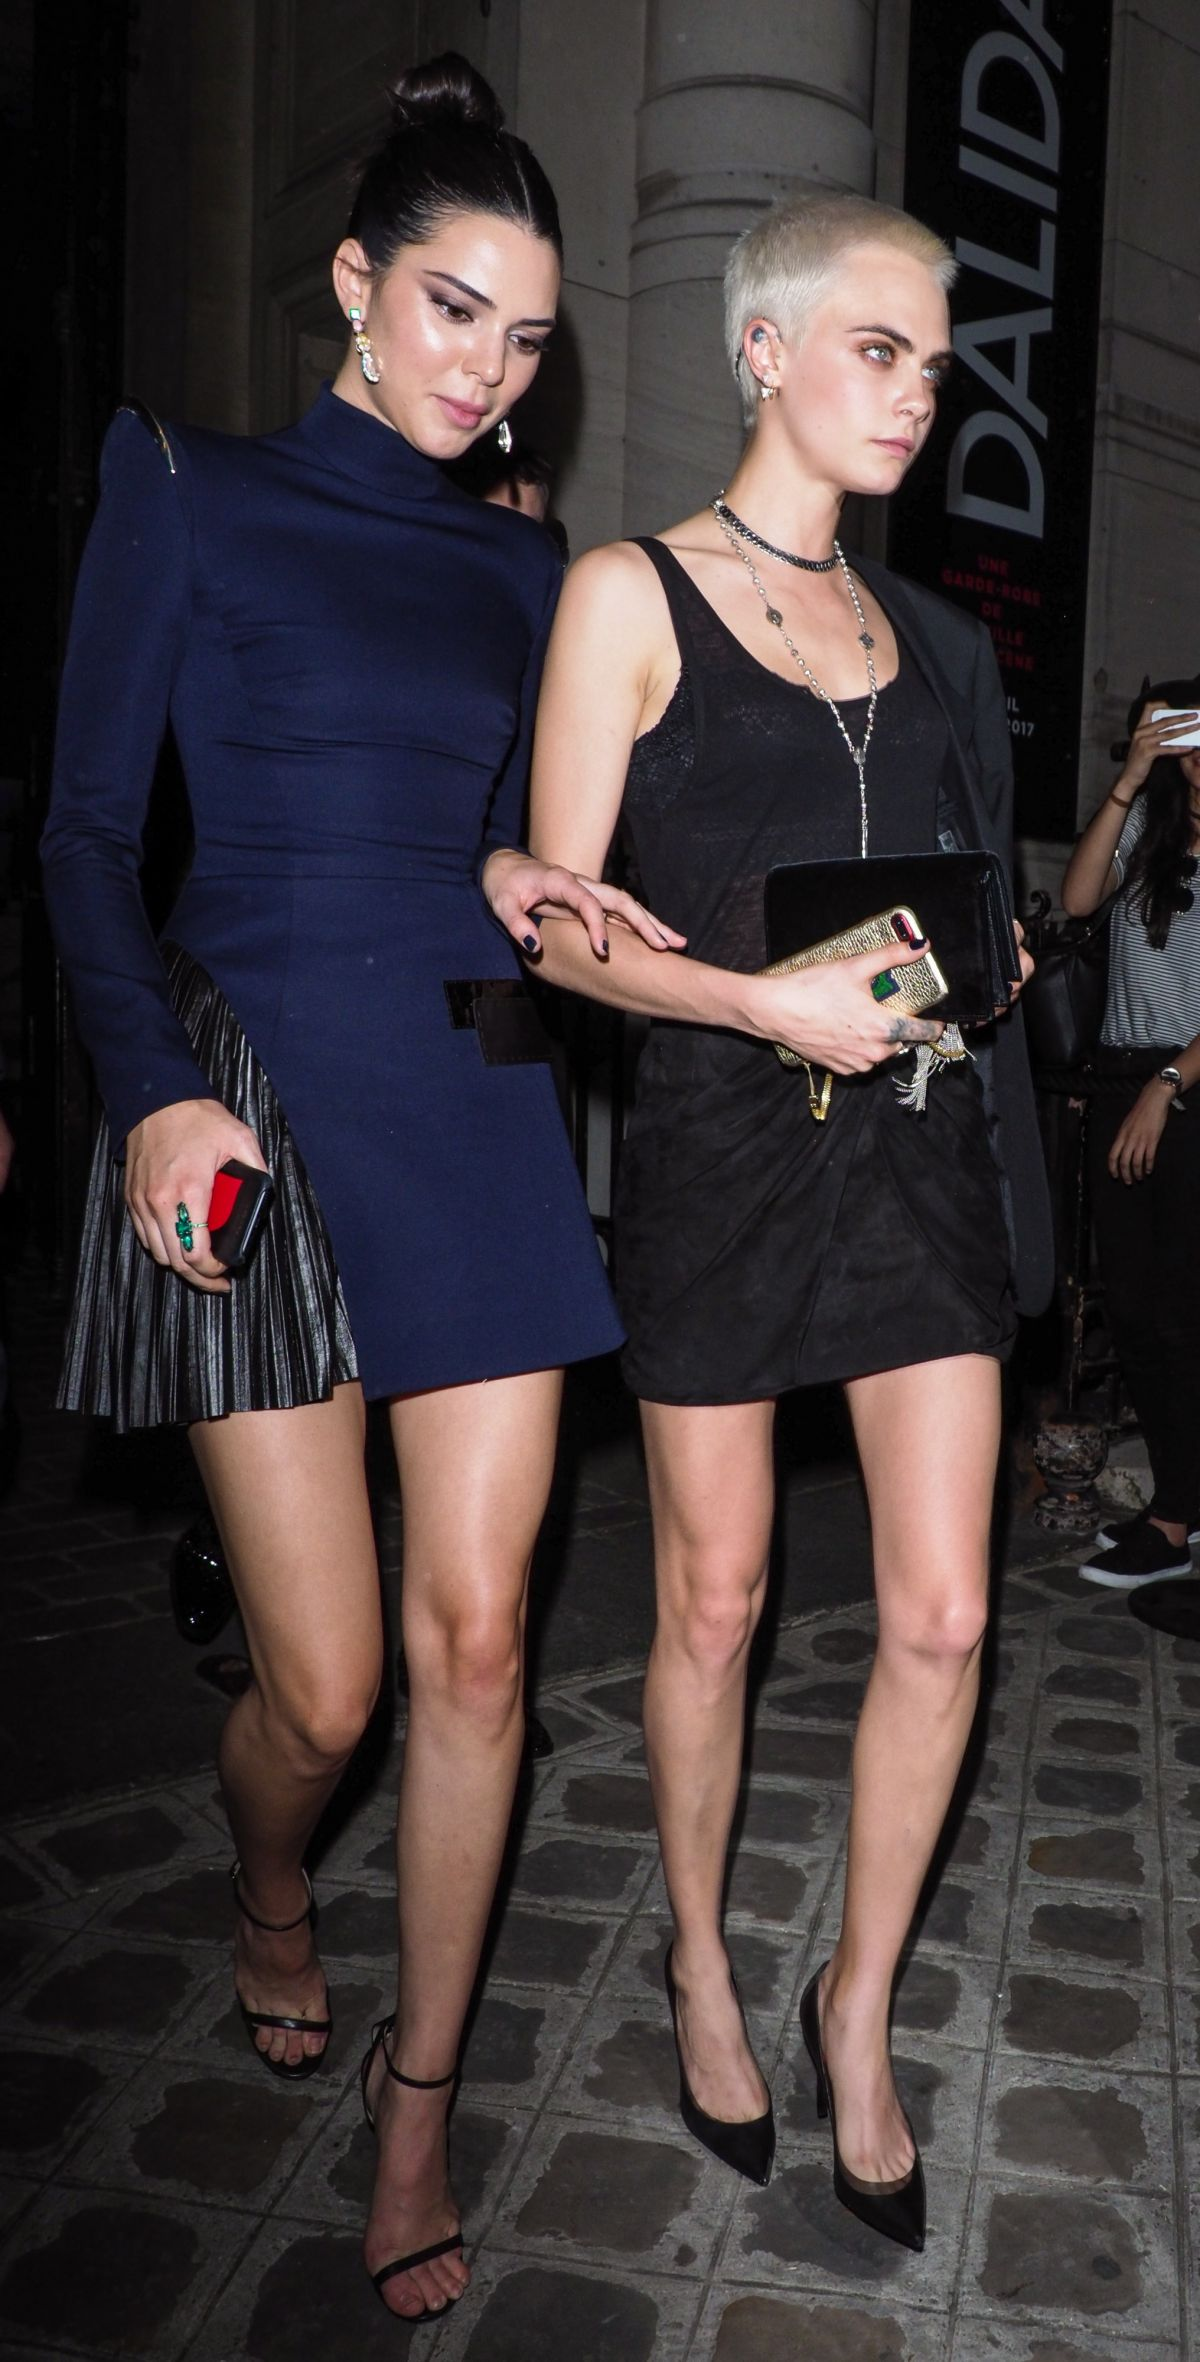 CARA DELEVINGNE and KENDALL JENNER at Vogue Party at Paris Fashion Week 07/04/2017